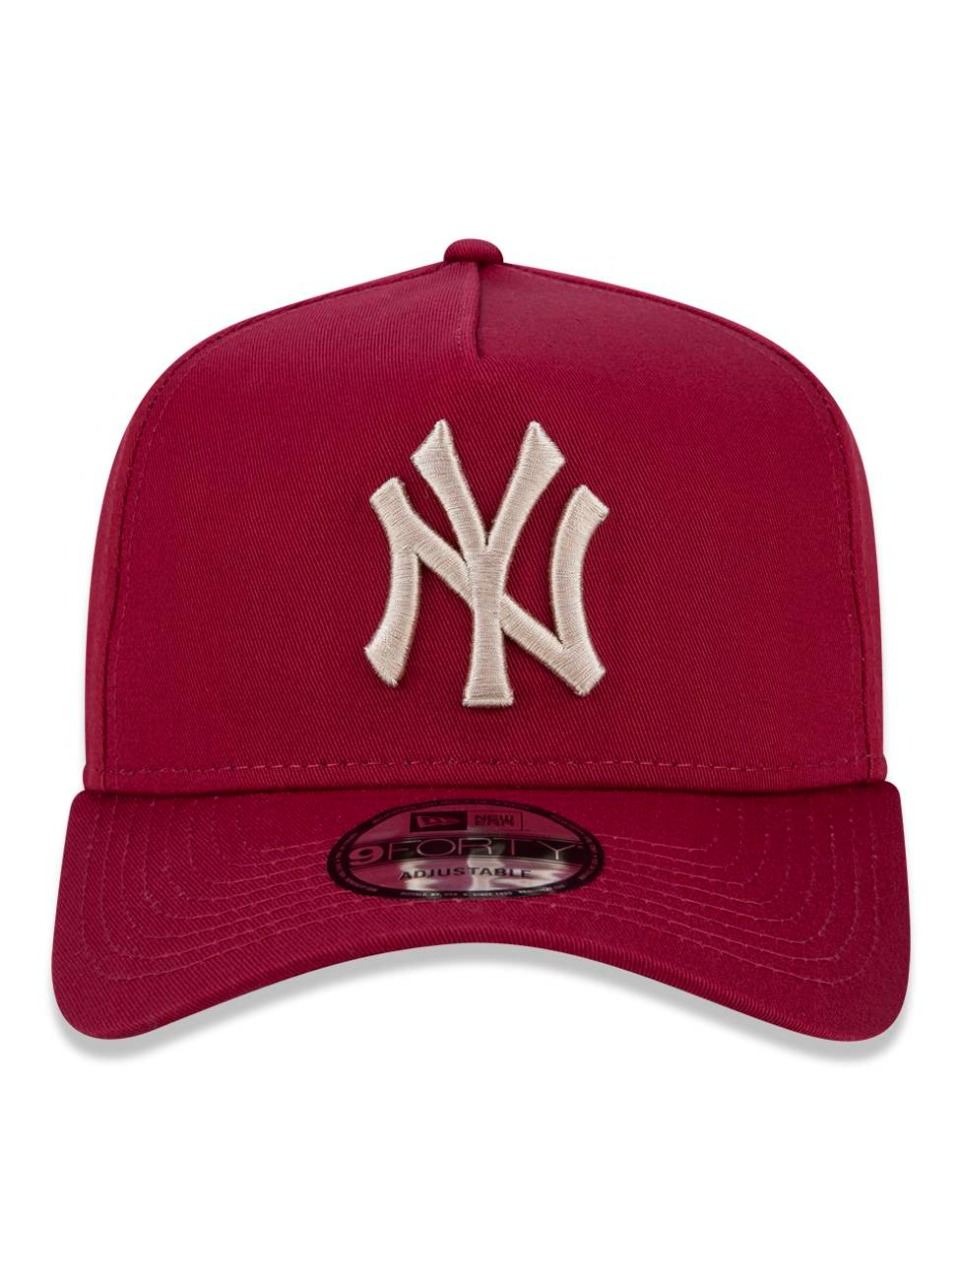 BONÉ NEW ERA NEW YORK YANKEES MLB VERMELHO BORDÔ